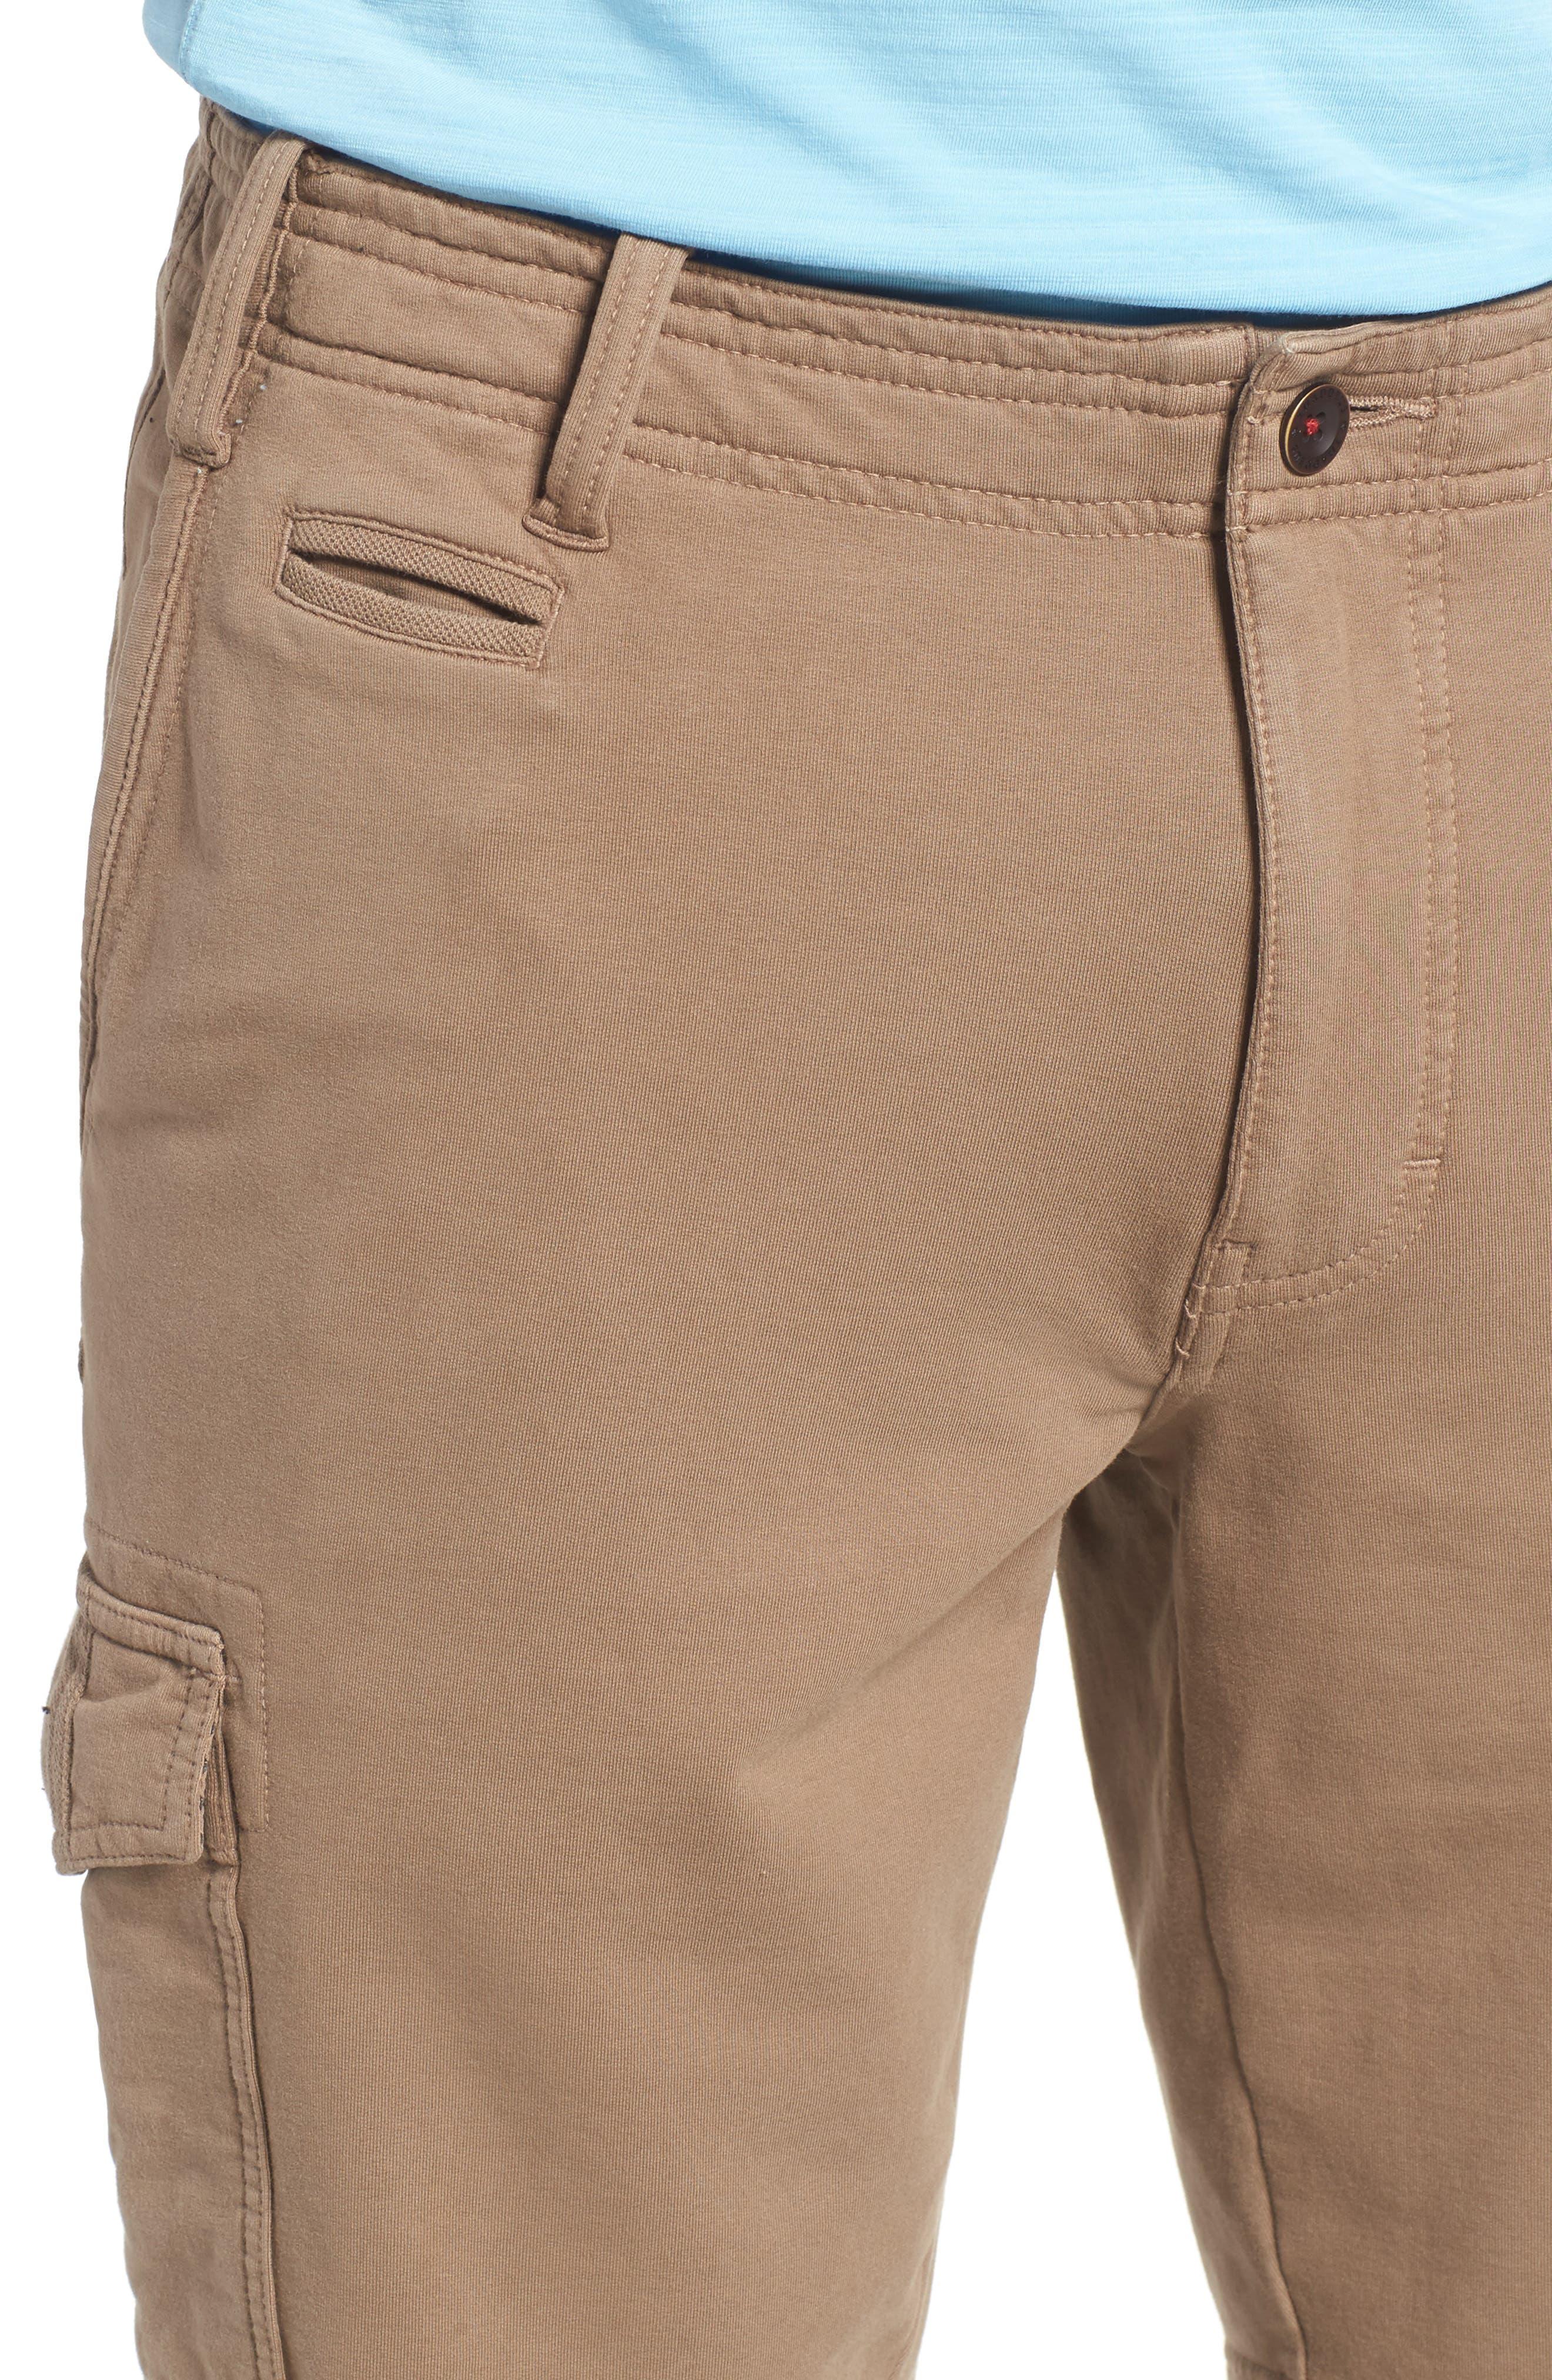 Carlton Knit Cargo Shorts,                             Alternate thumbnail 4, color,                             249